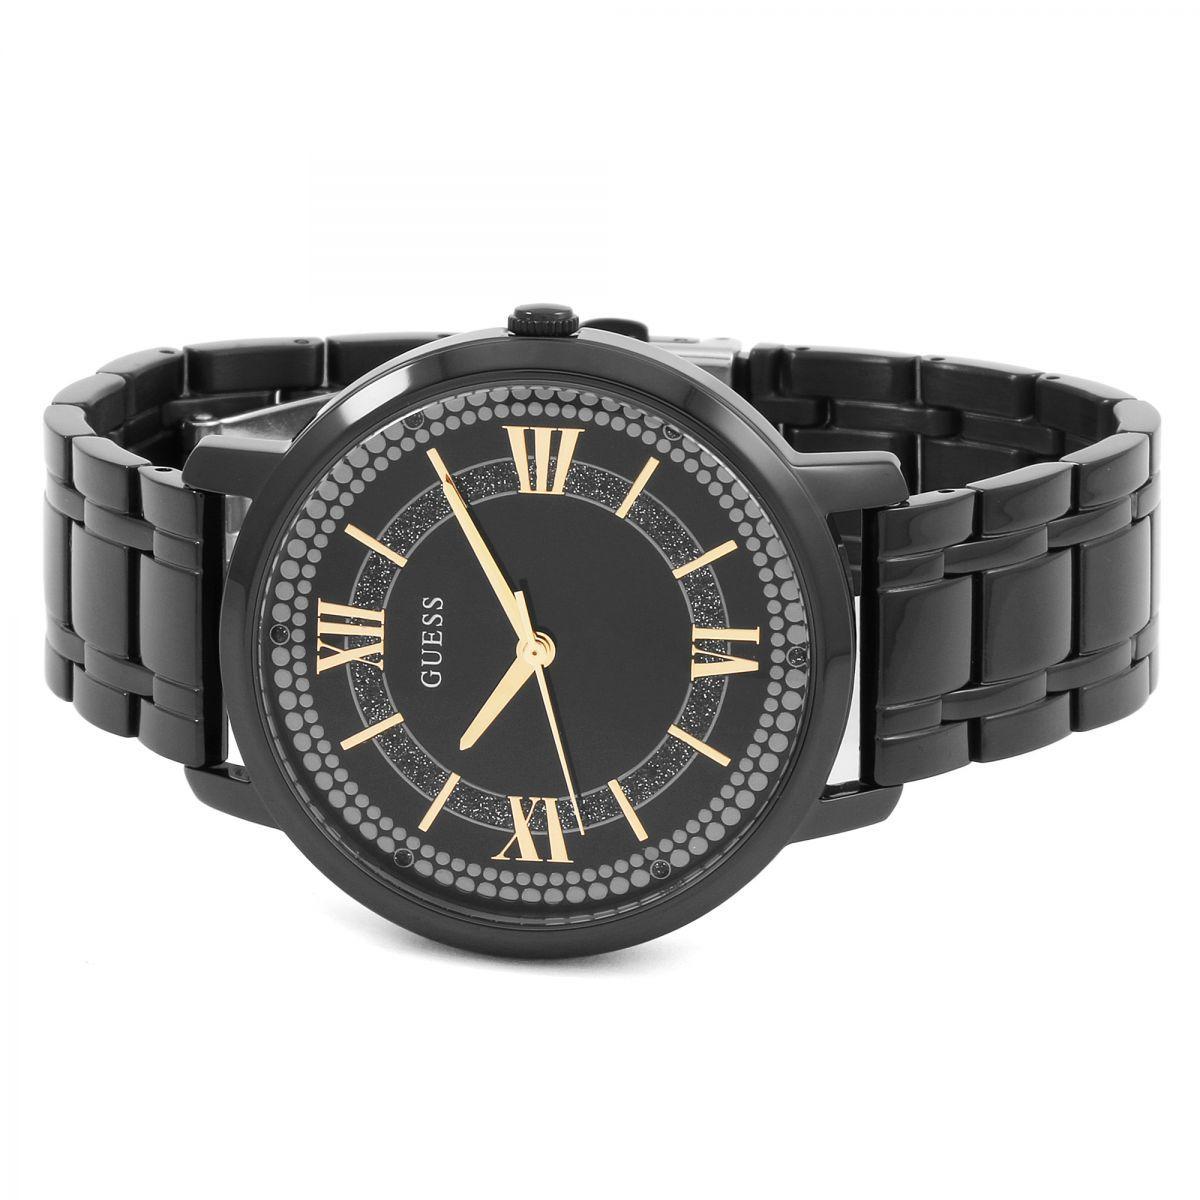 Relógio Guess Feminino  Preto - 92635LPGDPA5